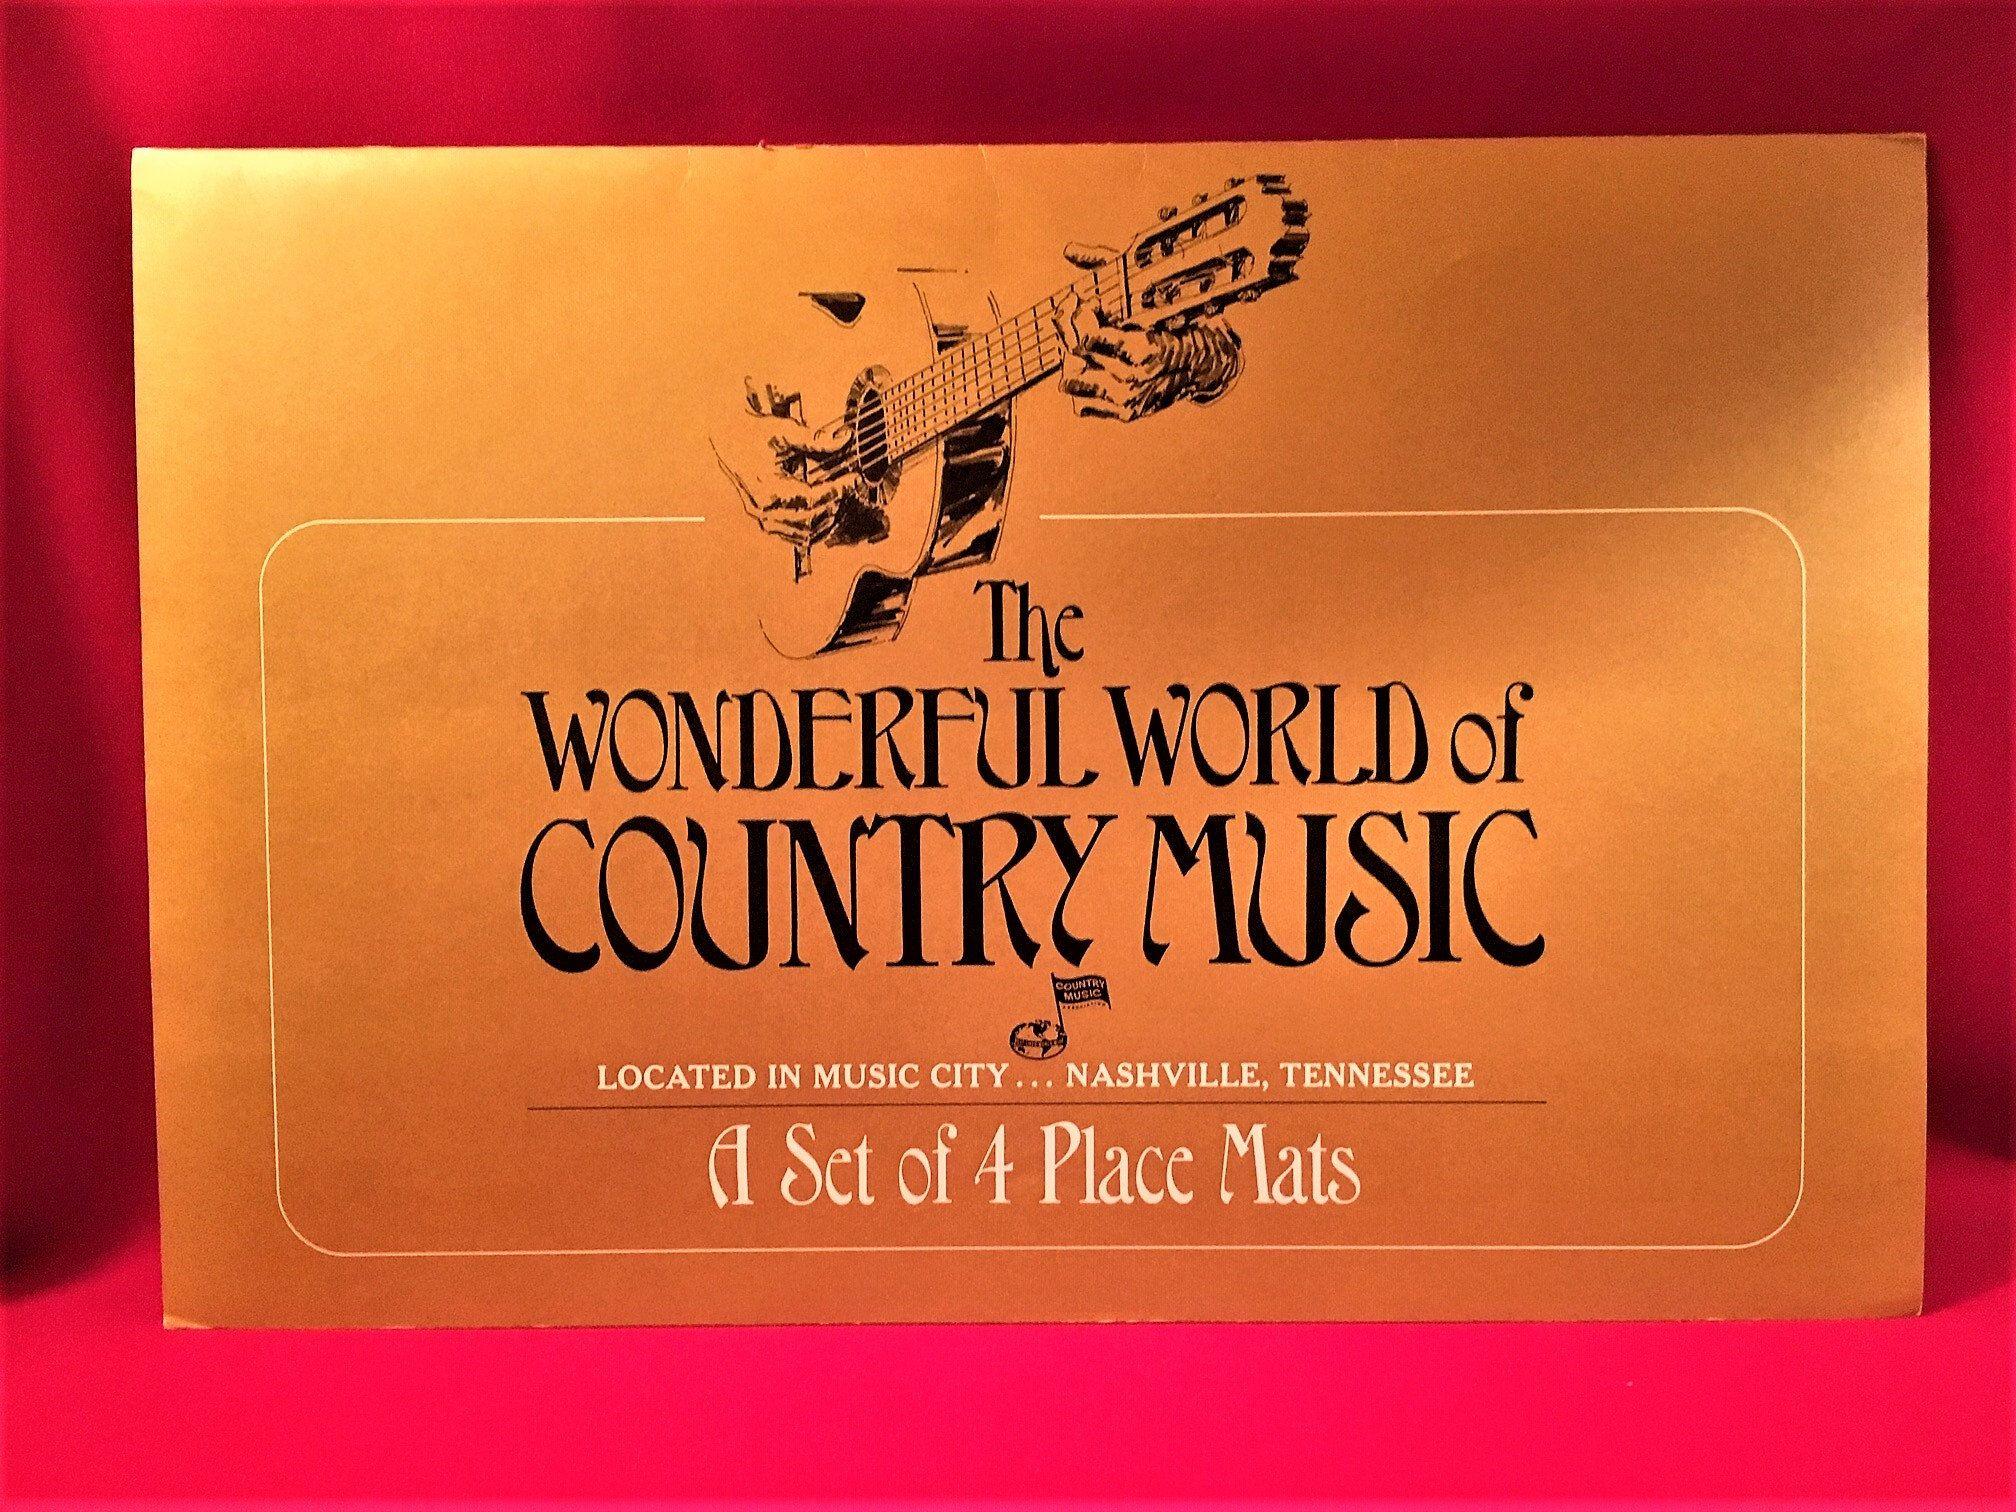 Wonderful World Of Country Music Vinyl Placemats Tex Etsy Country Music Wonders Of The World Grand Ole Opry